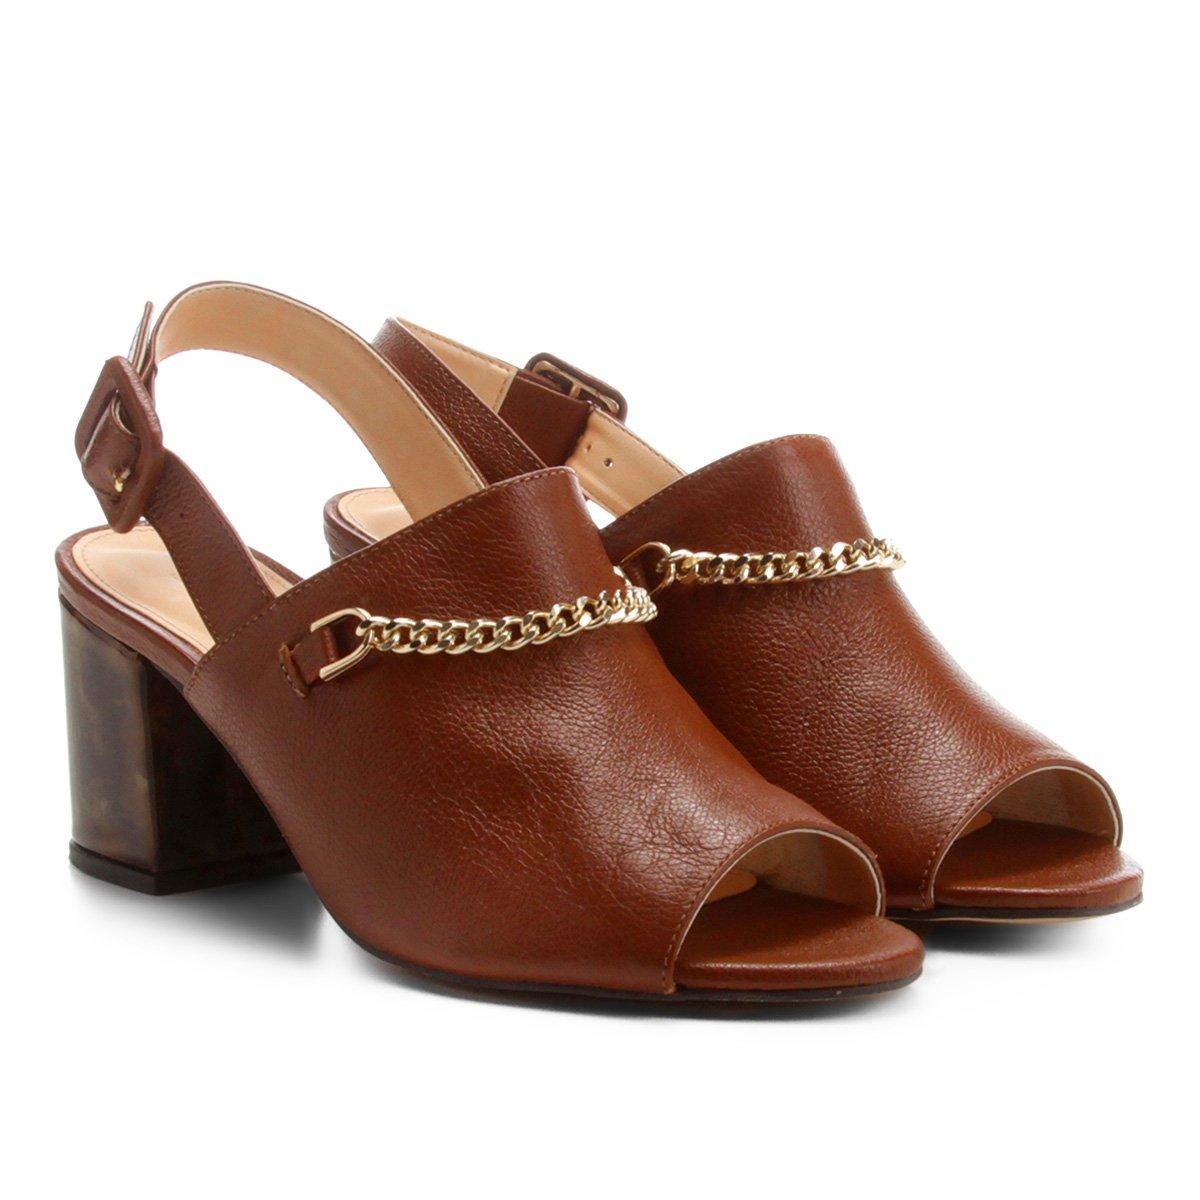 0abaaa9bc0 Sandália Couro Shoestock Salto Grosso Tartaruga Feminina